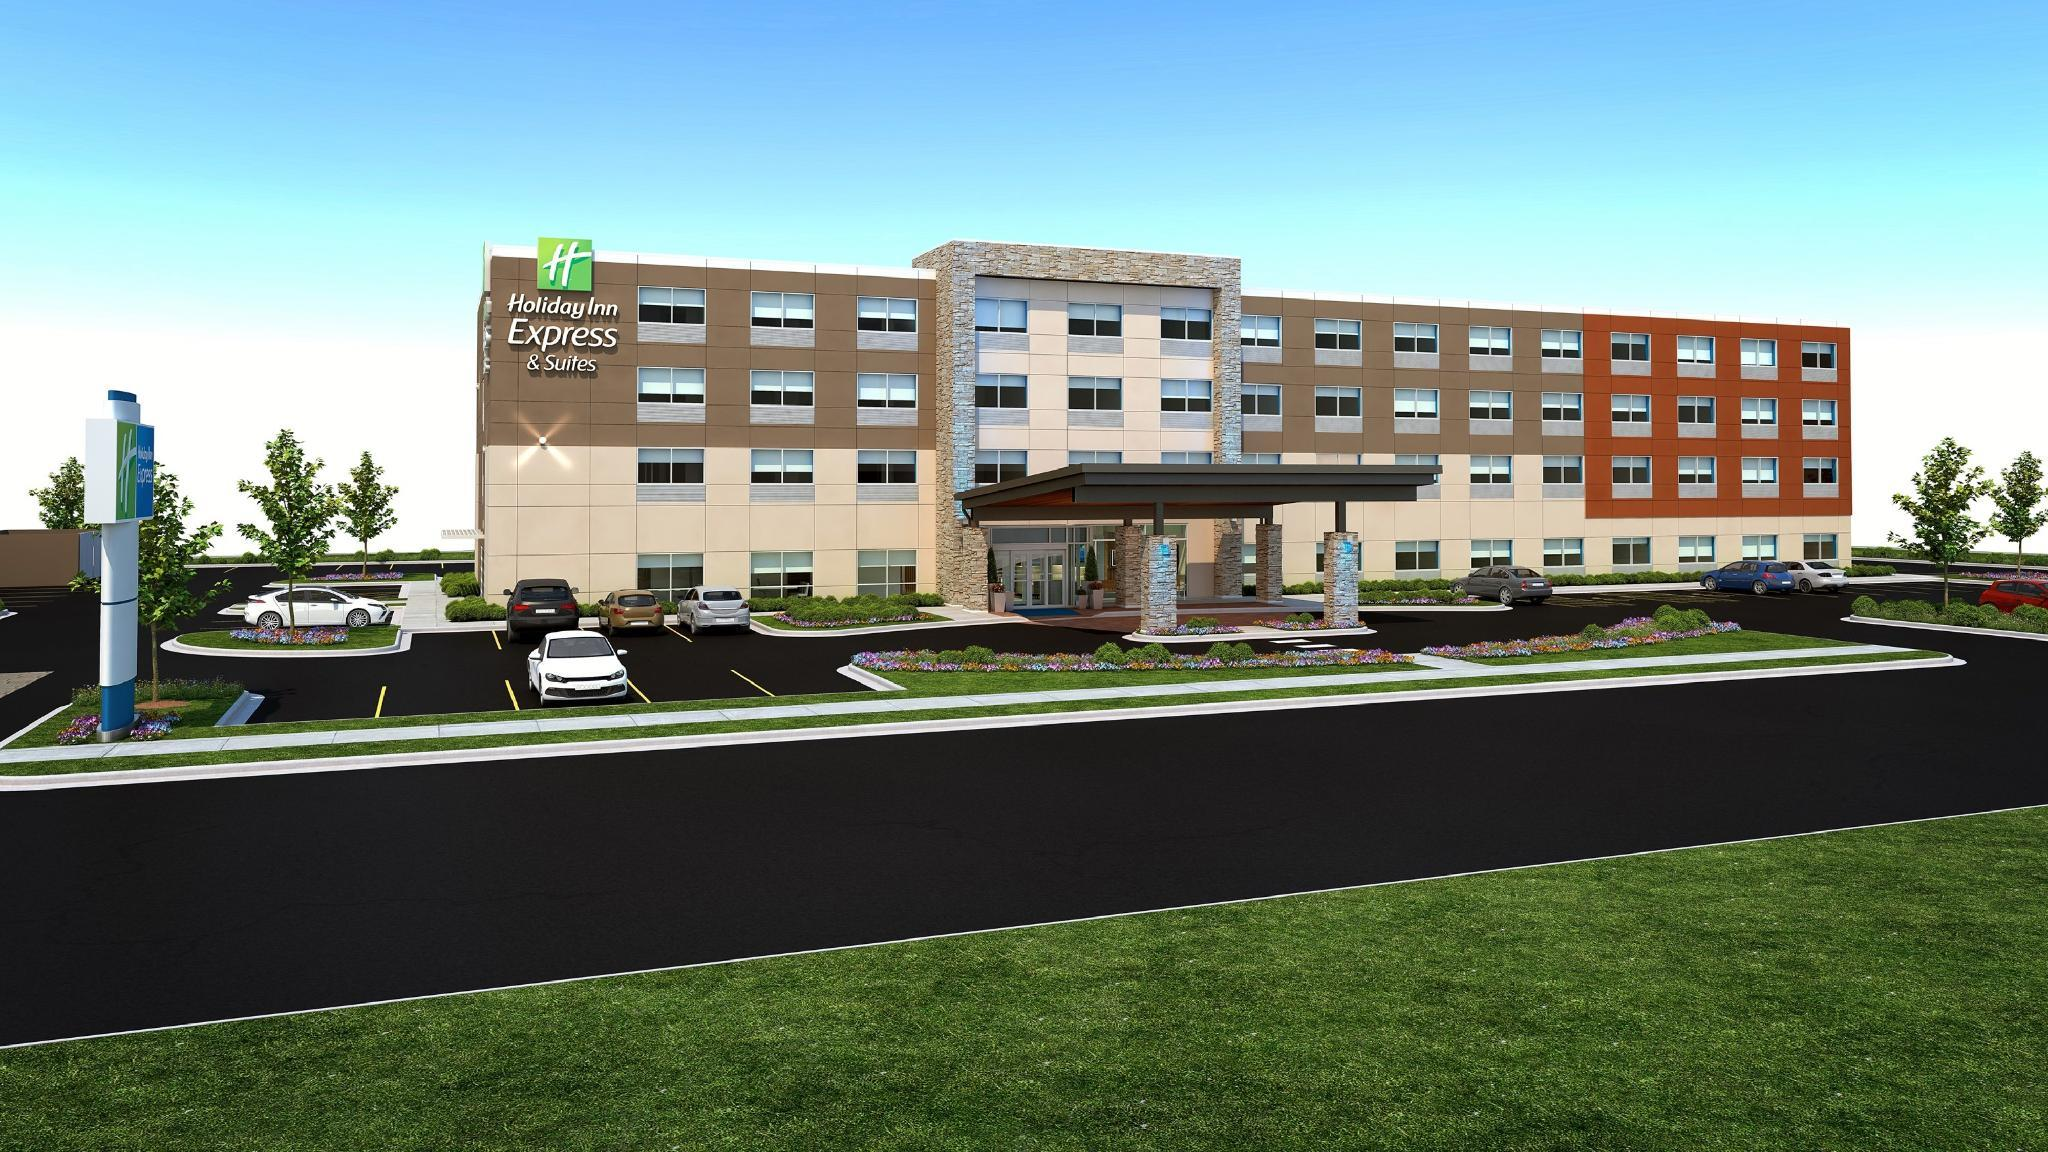 Holiday Inn Express Kearney Kearney (MO) United States